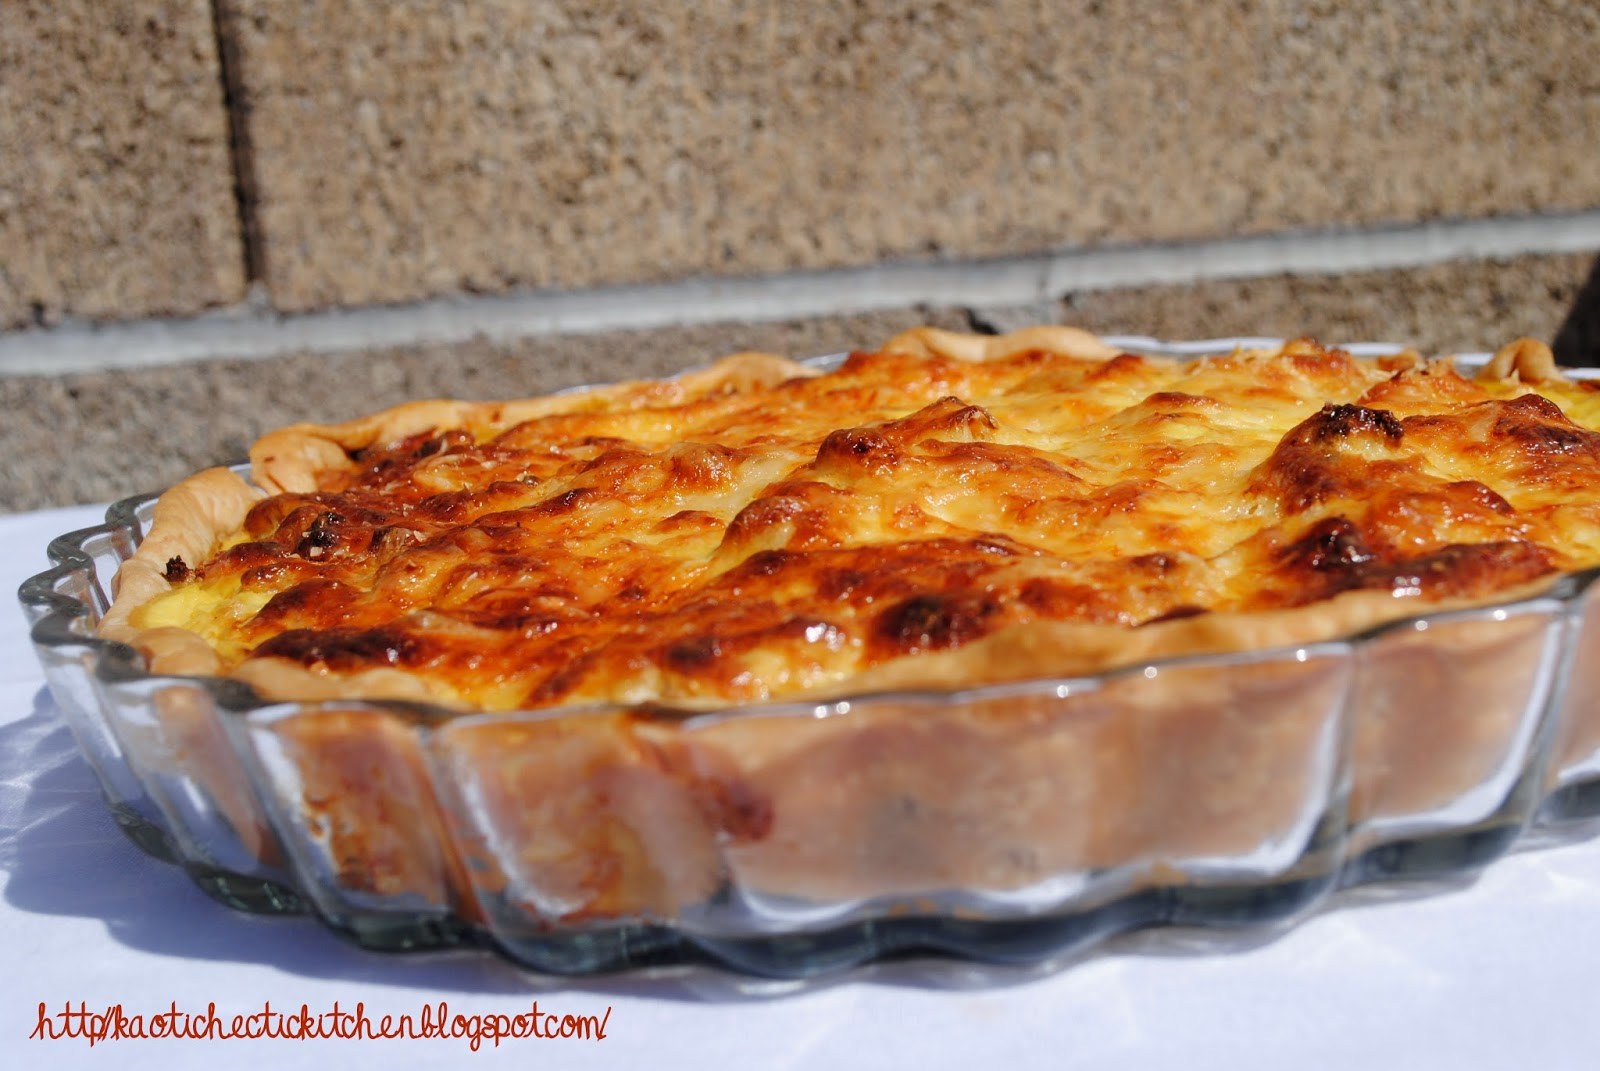 my kaotic kitchen: roasted cauliflower and caramelized onion tart